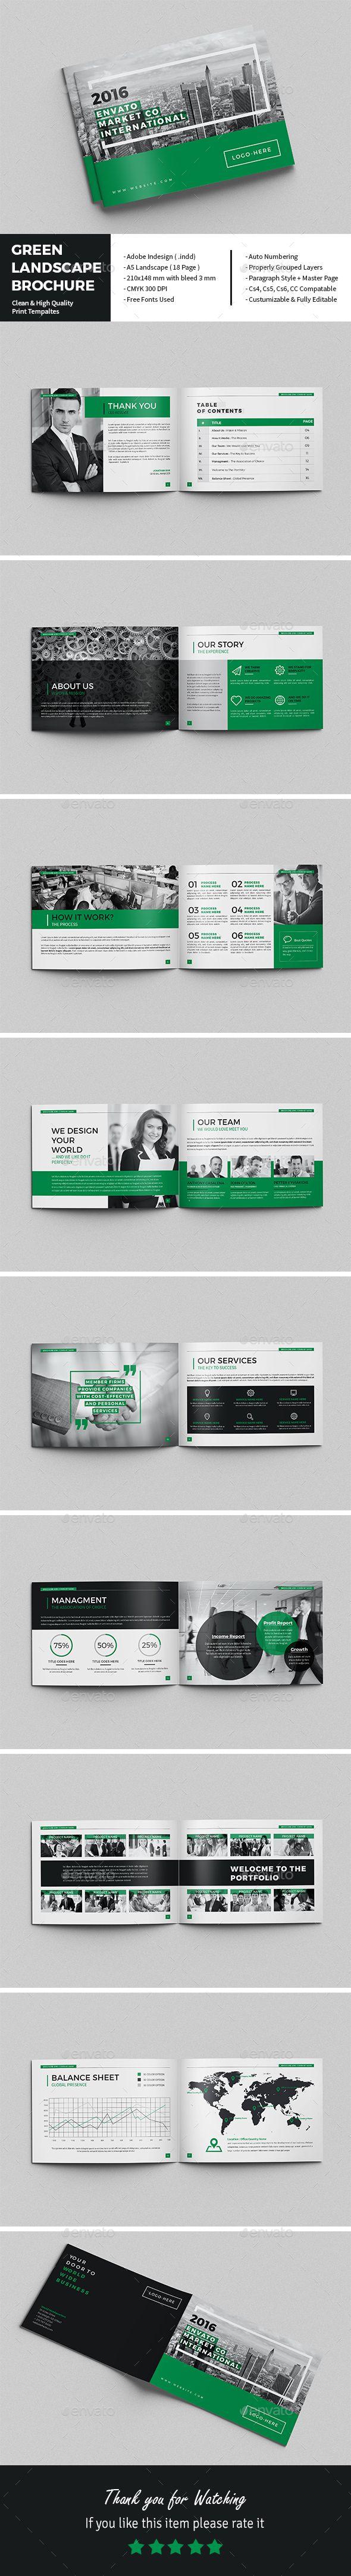 Green Landscape Brochure Template InDesign INDD. Download here: https://graphicriver.net/item/green-landscape-brochure/17205438?ref=ksioks